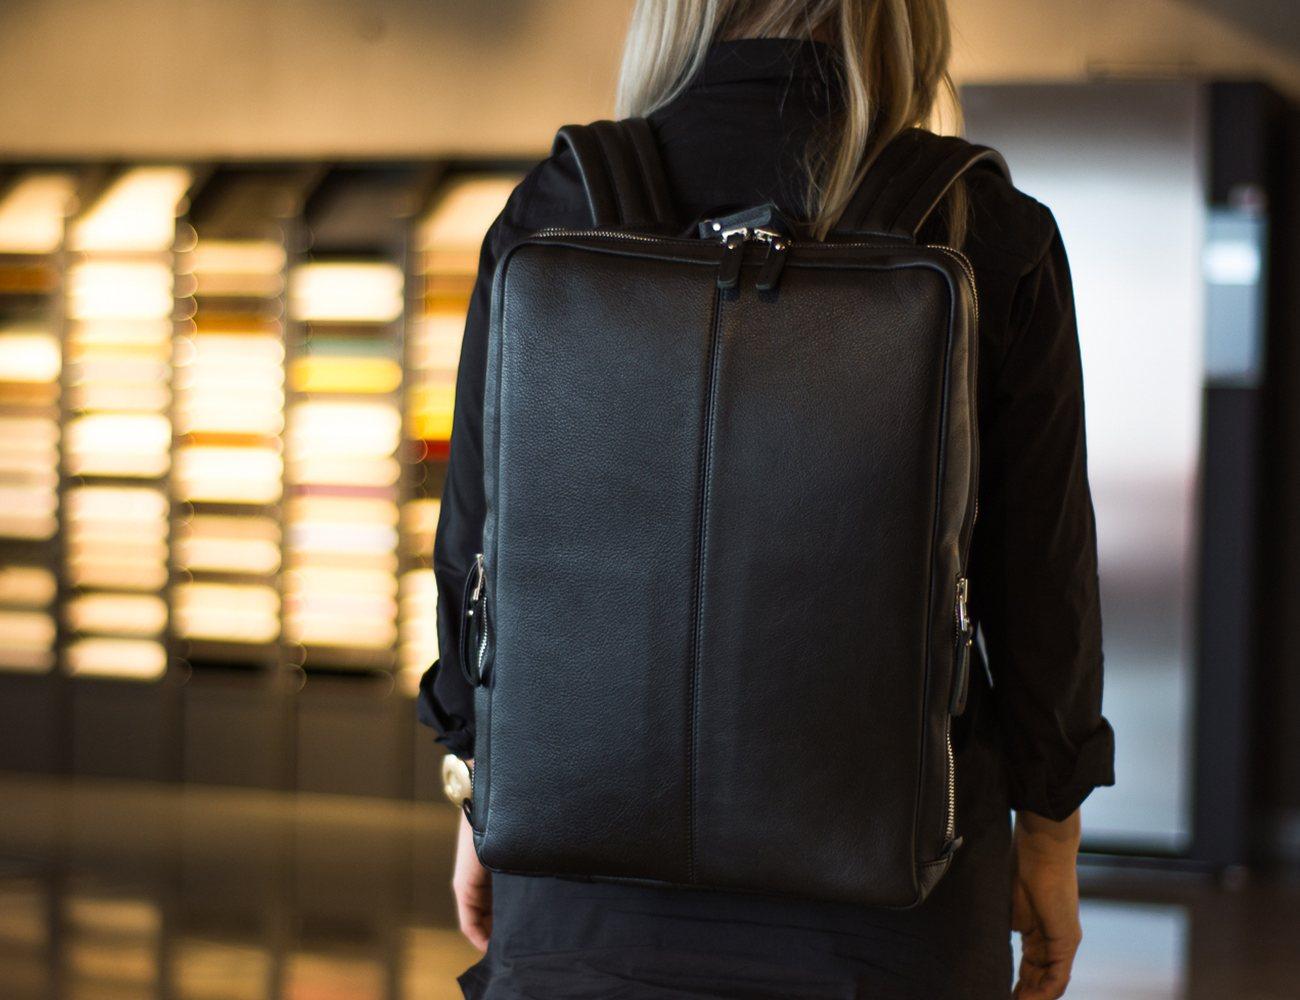 Otenteko Modern Minimalist Leather Backpacks